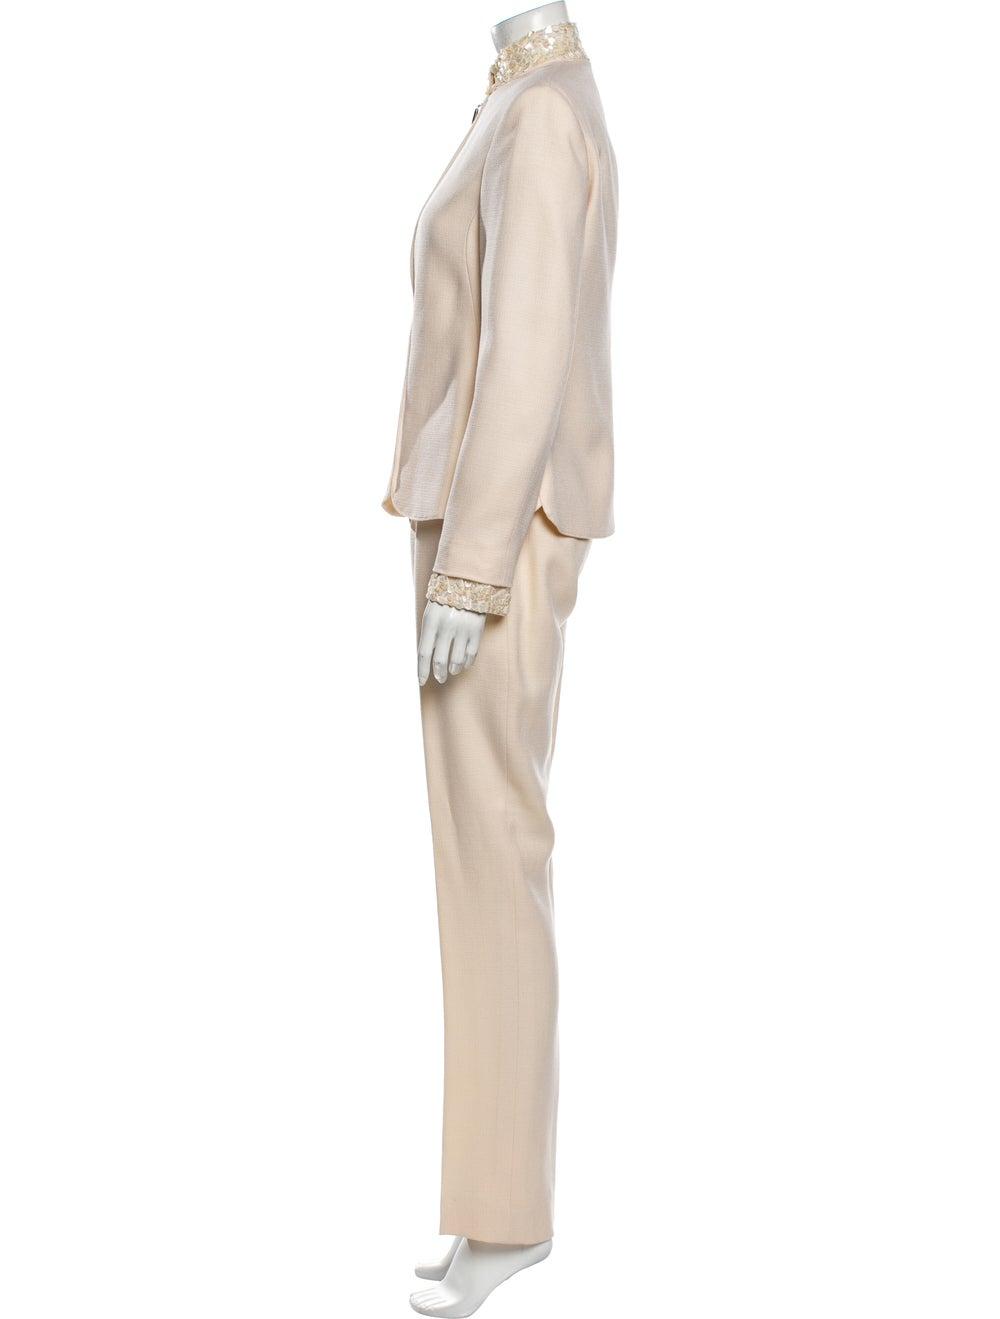 Gianni Versace Vintage 1990's Pantsuit - image 2